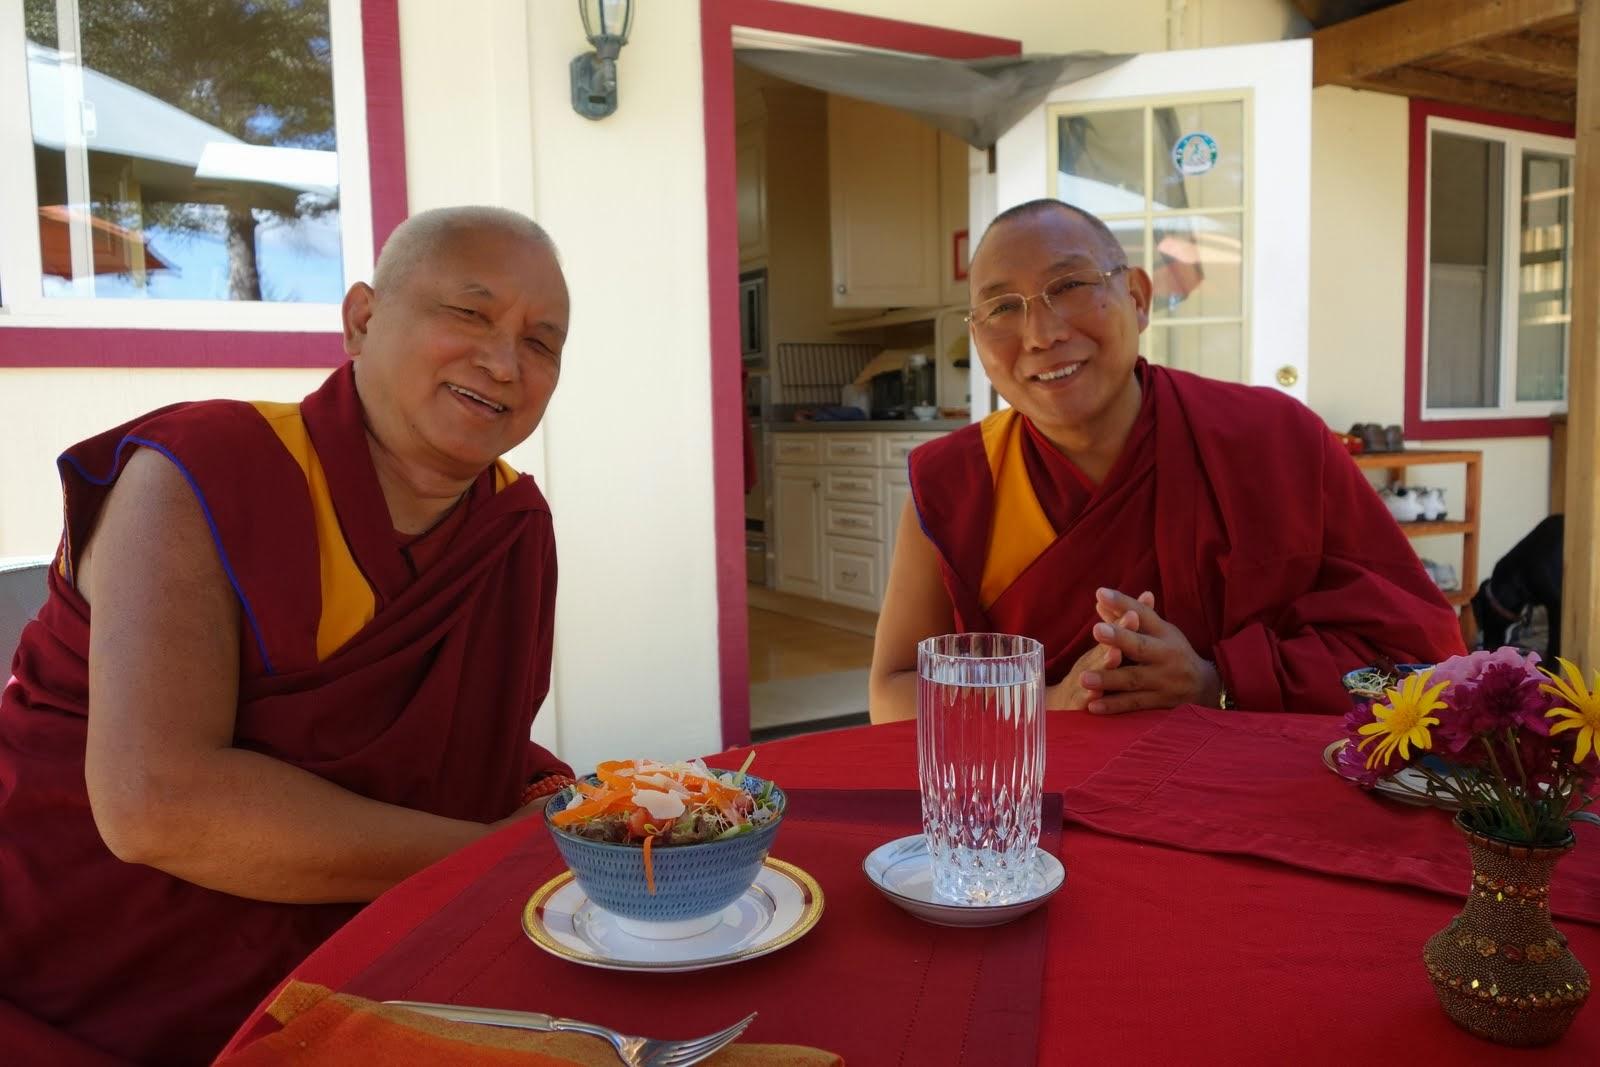 Lama Zopa Rinpoche and Dagri Rinpoche having lunch at Kachoe Dechen Ling, CA, USA Oct 2013. Photo: Ven. Roger Kunsang